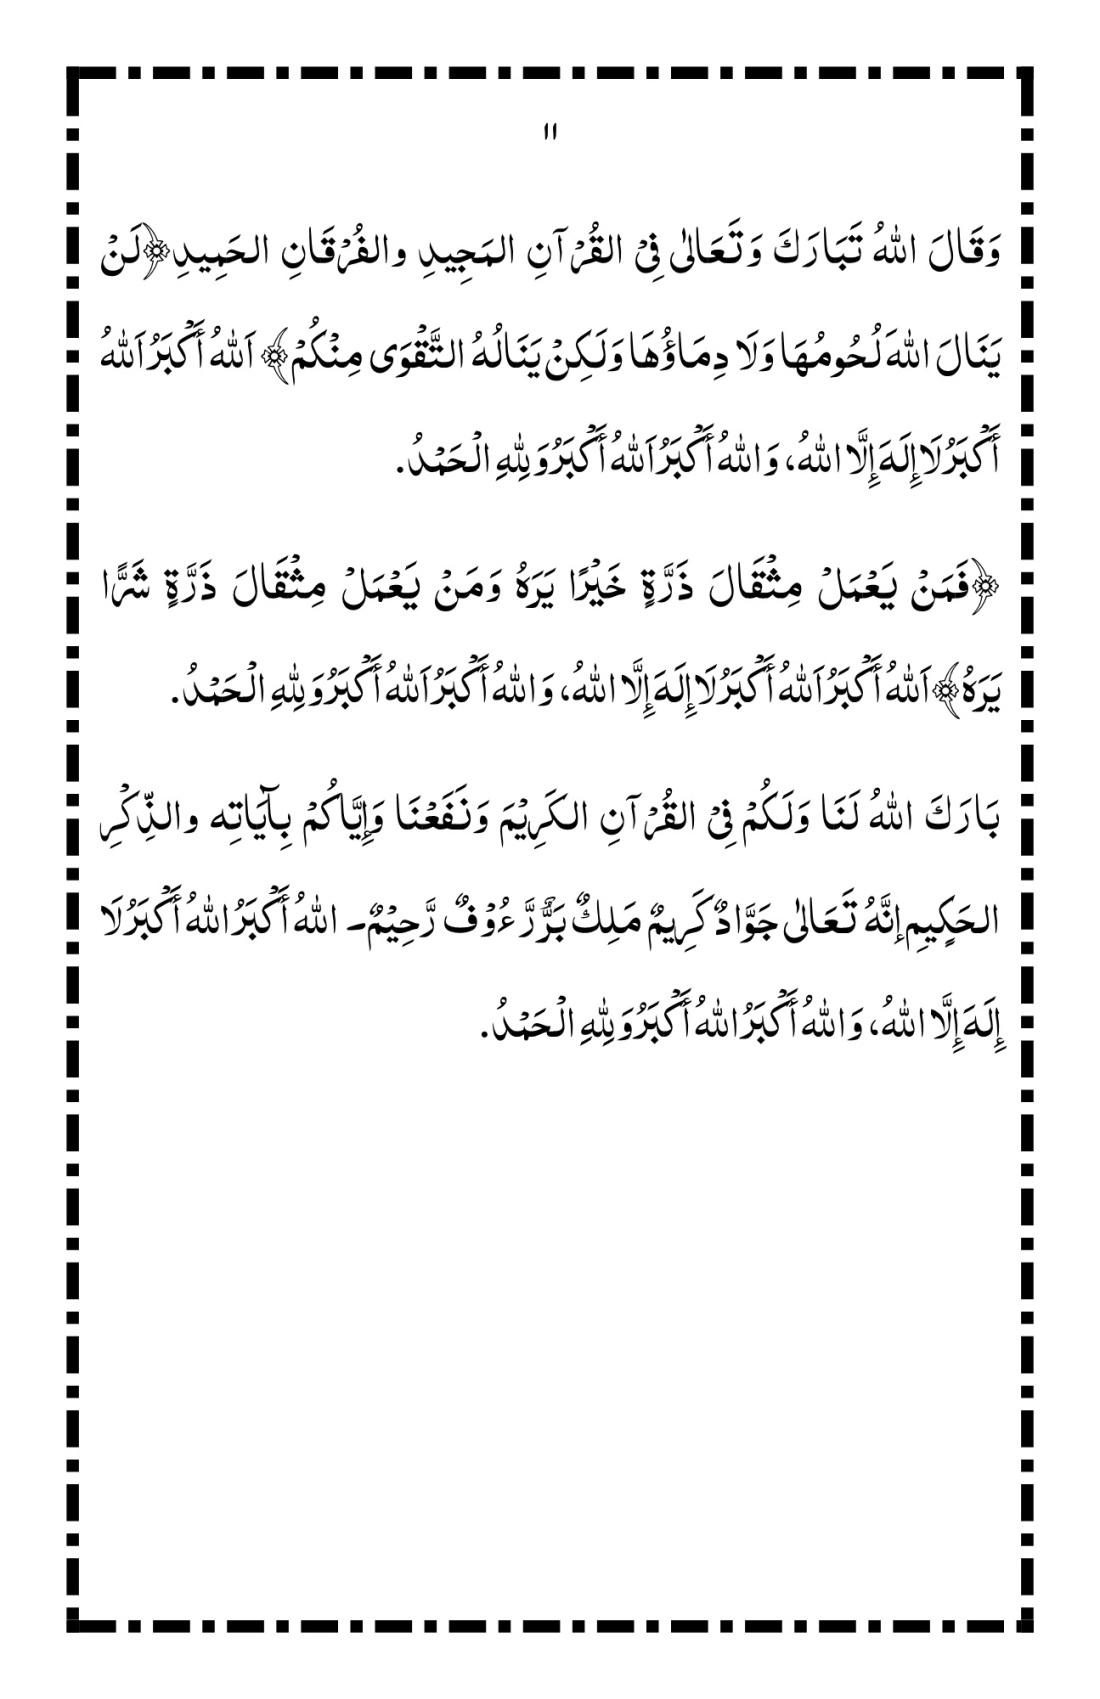 khutba-eif-ul-fitr-adha-6